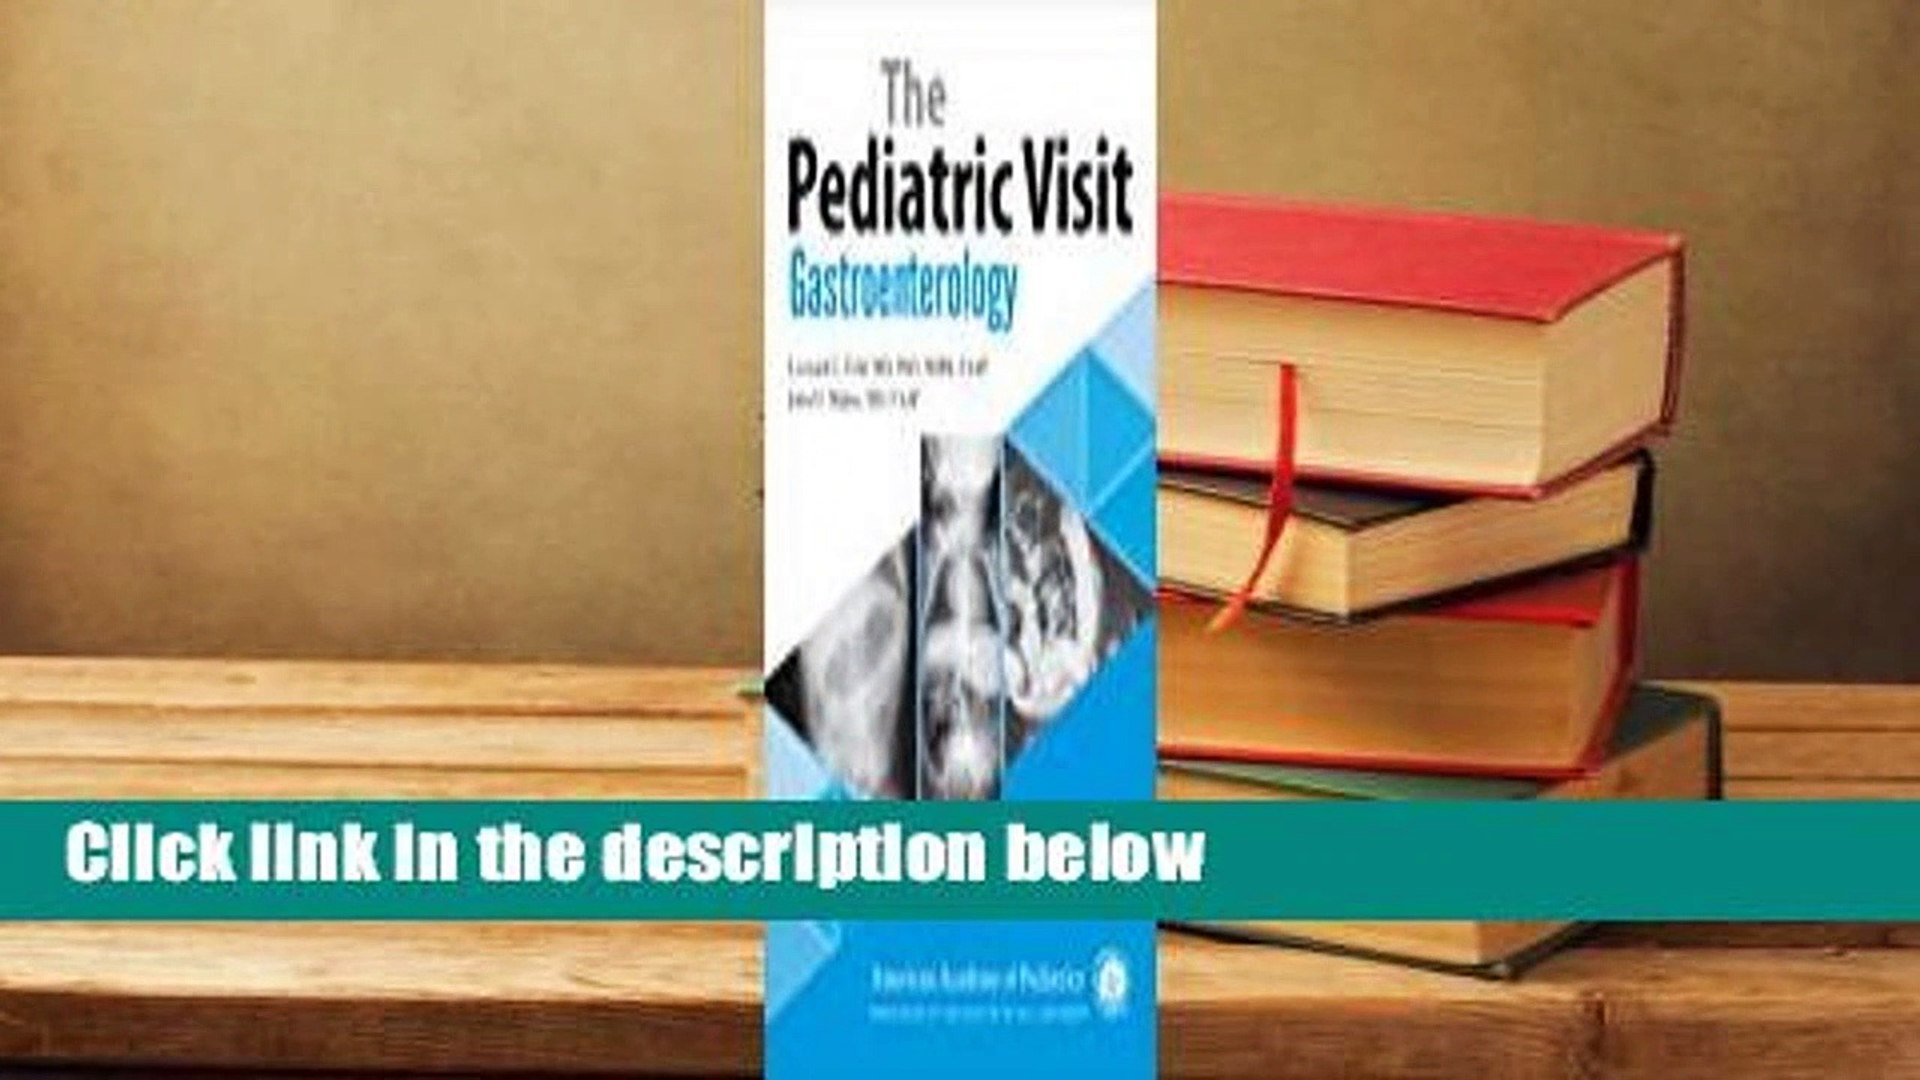 Full E-book  The Pediatric Visit: Gastroenterology  Review